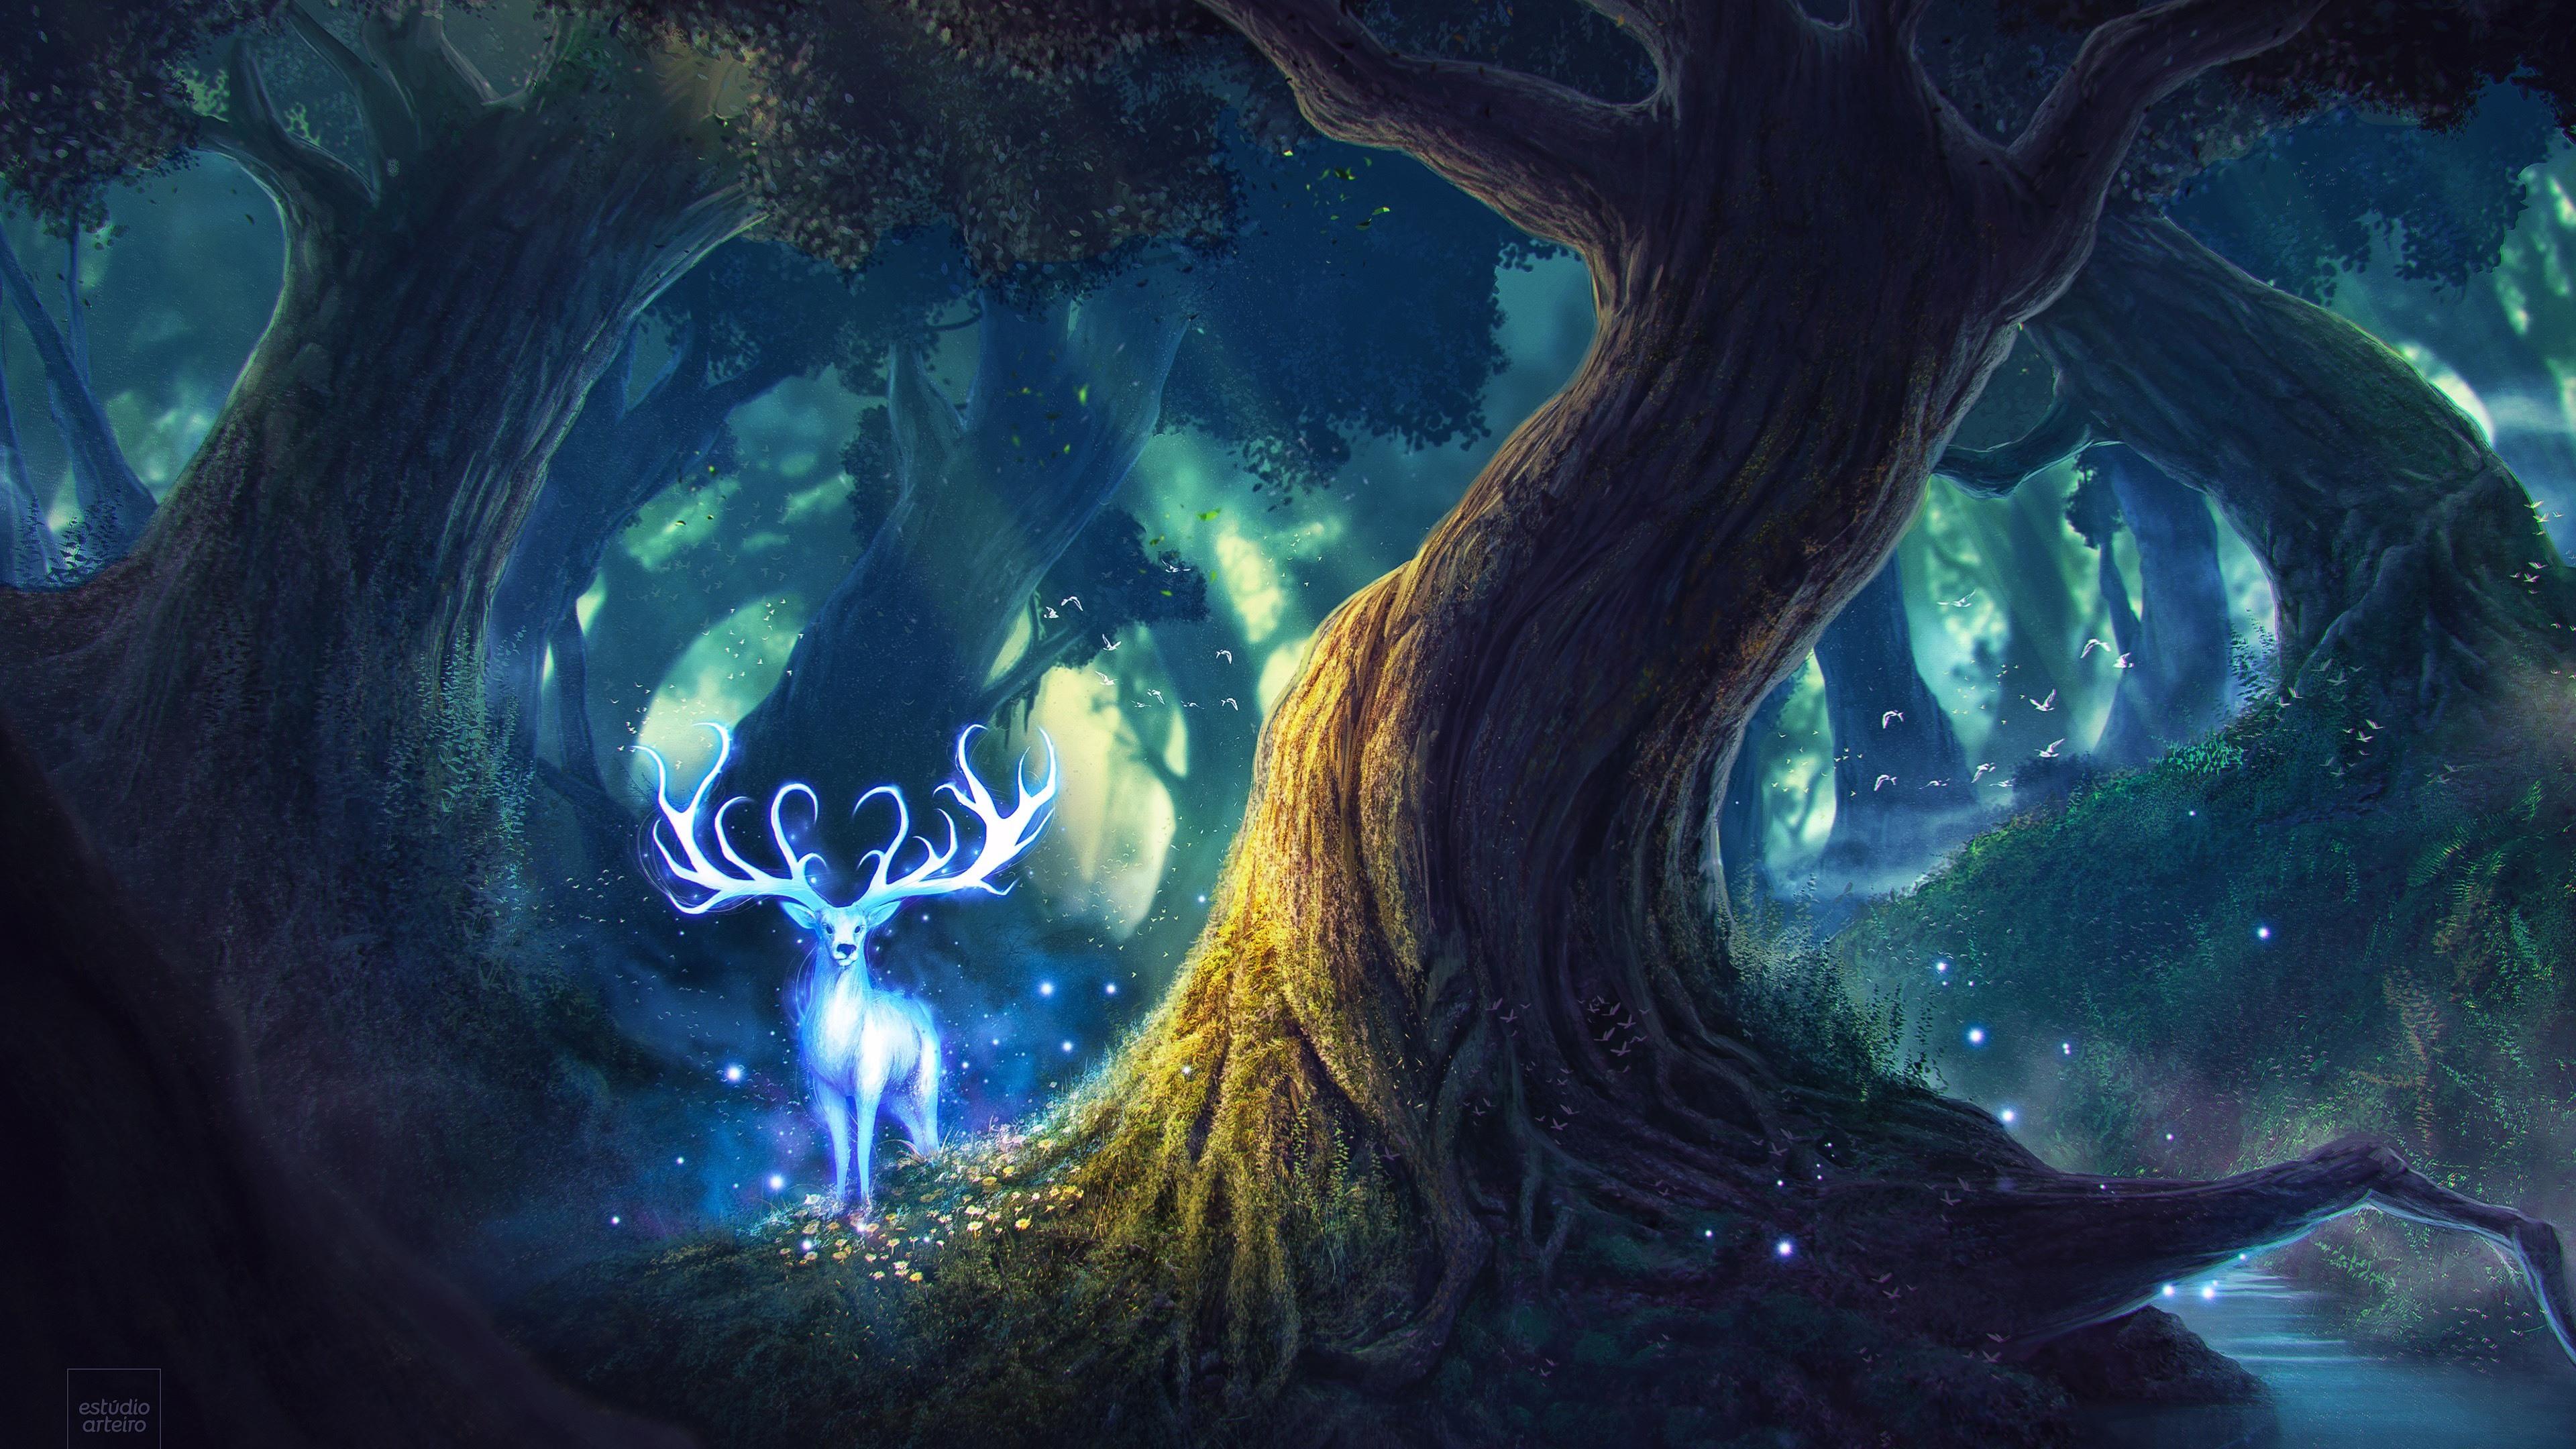 magic forest fantasy deer 4k 1540751503 - Magic Forest Fantasy Deer 4k - hd-wallpapers, forest wallpapers, fantasy wallpapers, digital art wallpapers, deer wallpapers, creature wallpapers, artwork wallpapers, artstation wallpapers, artist wallpapers